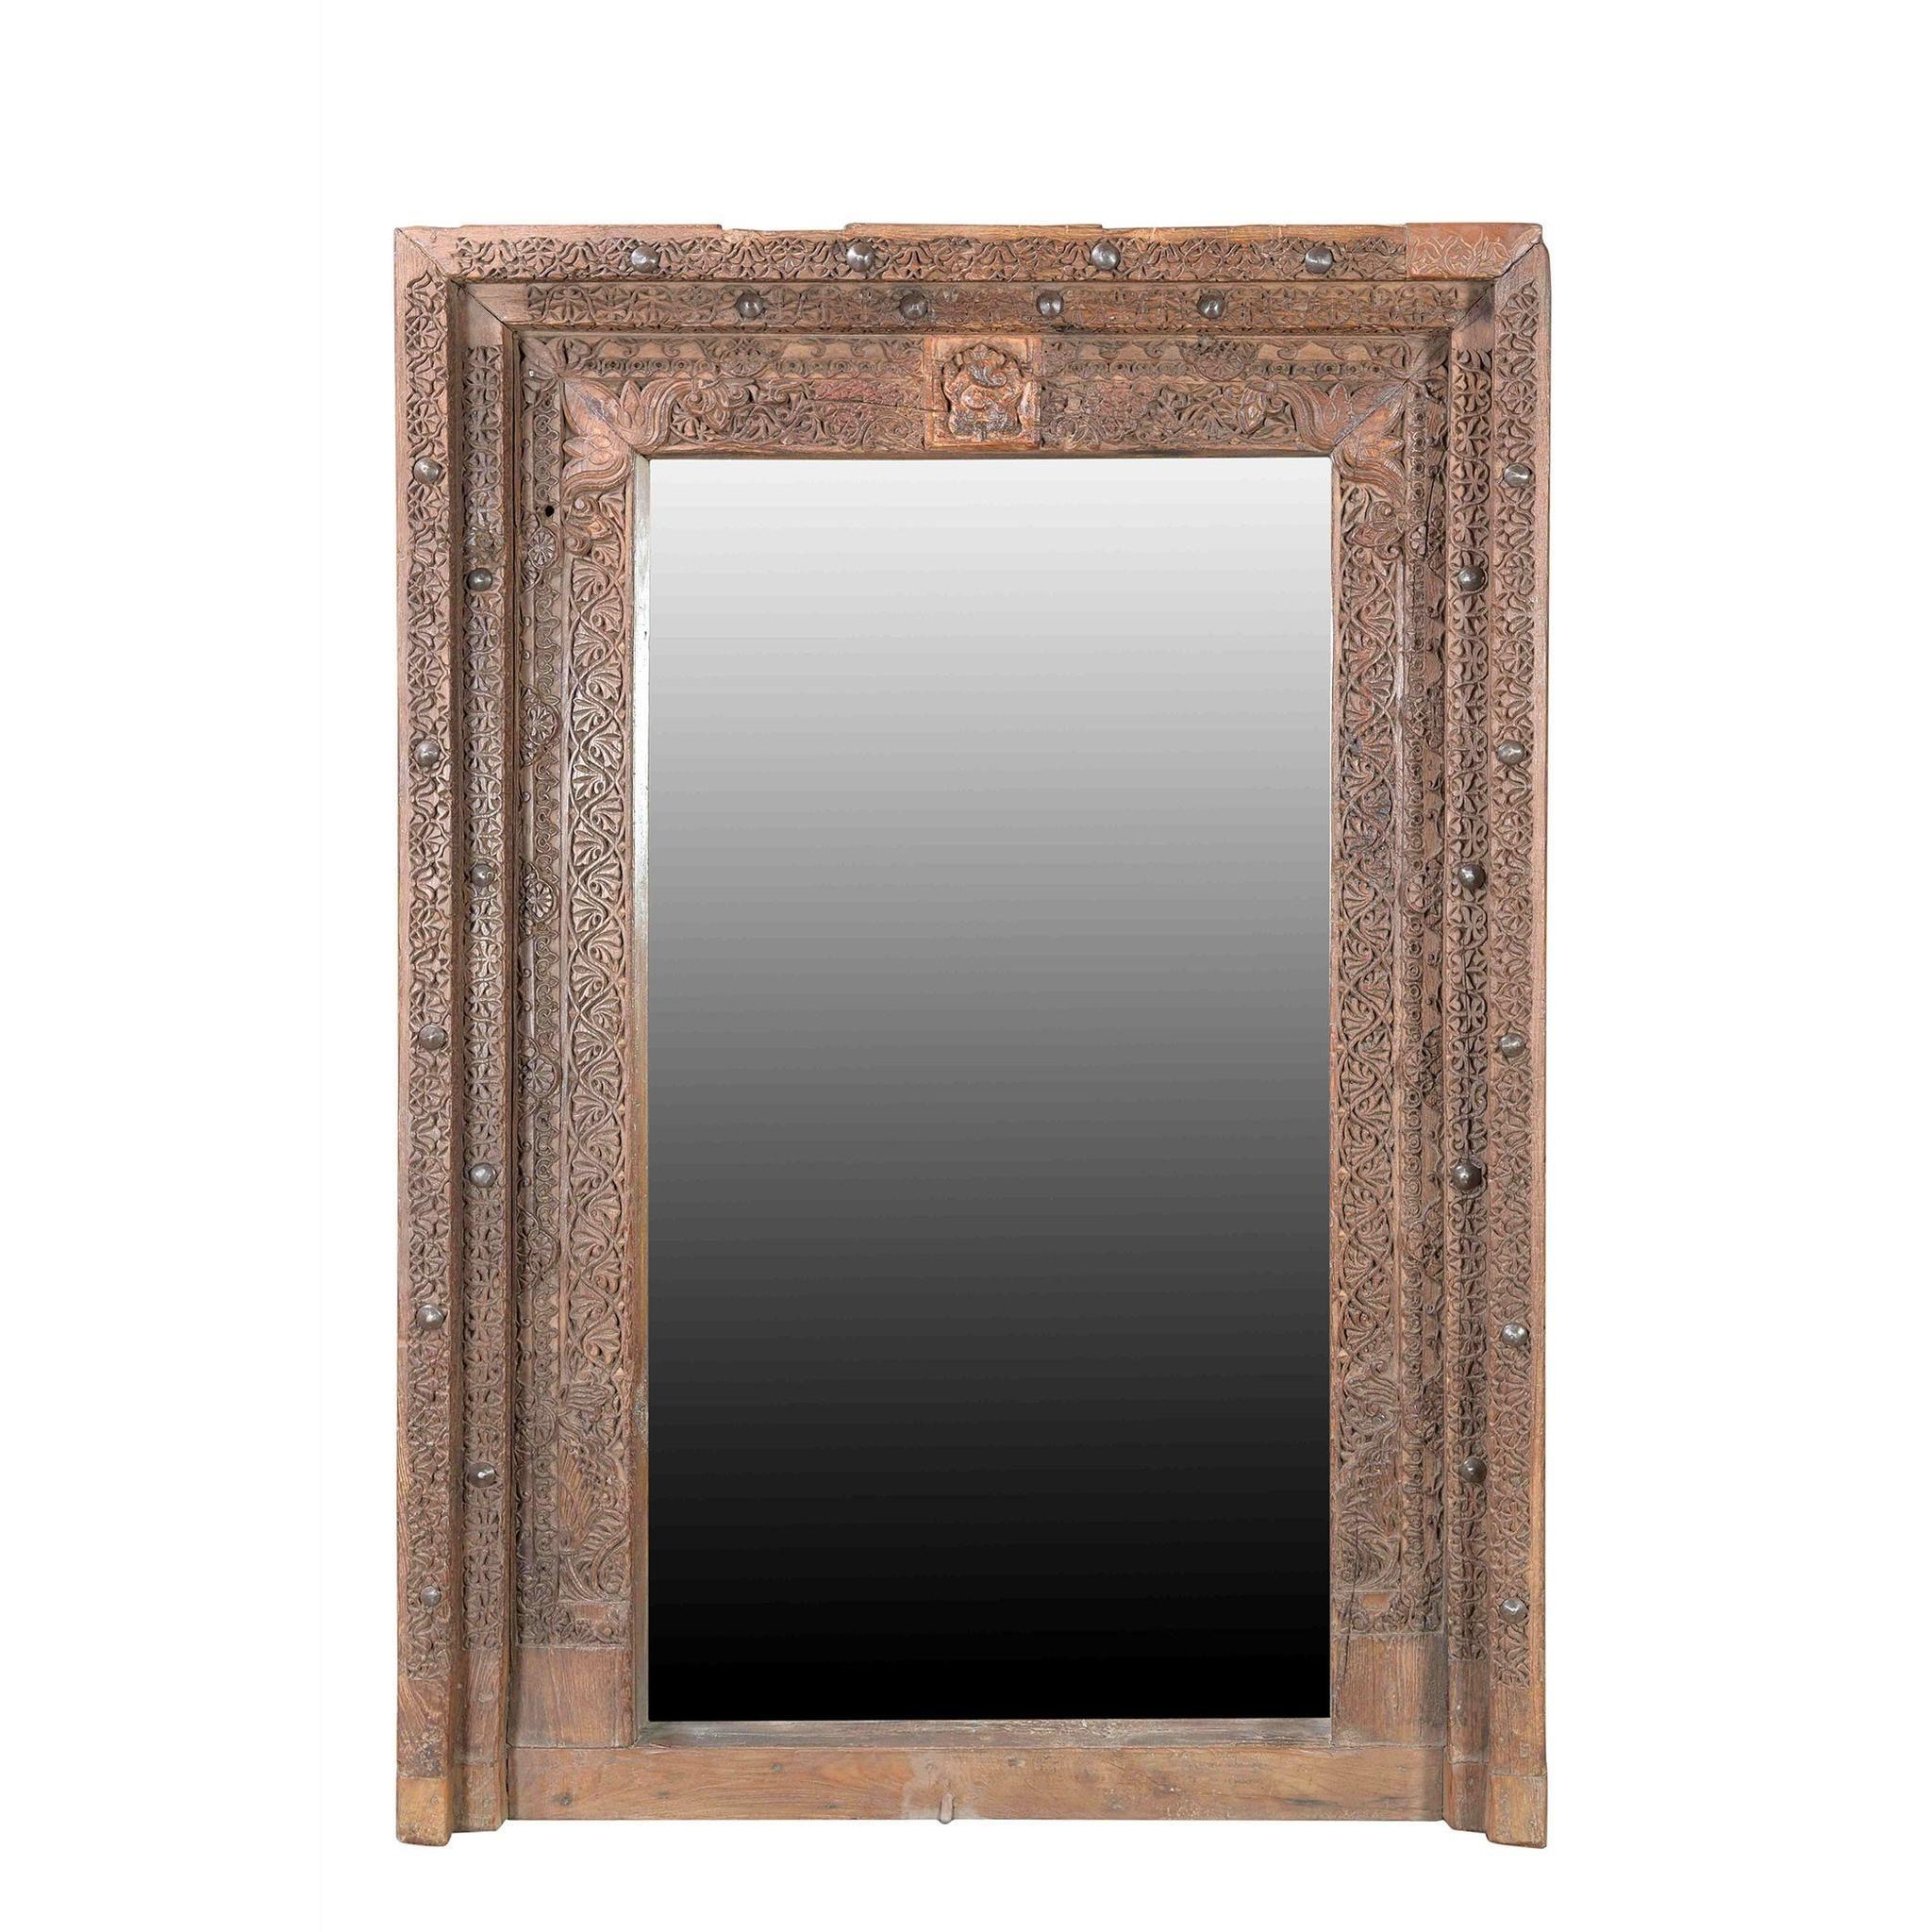 Mirror Made From 19thC Carved Teak Window | Mirror, Mirror ...